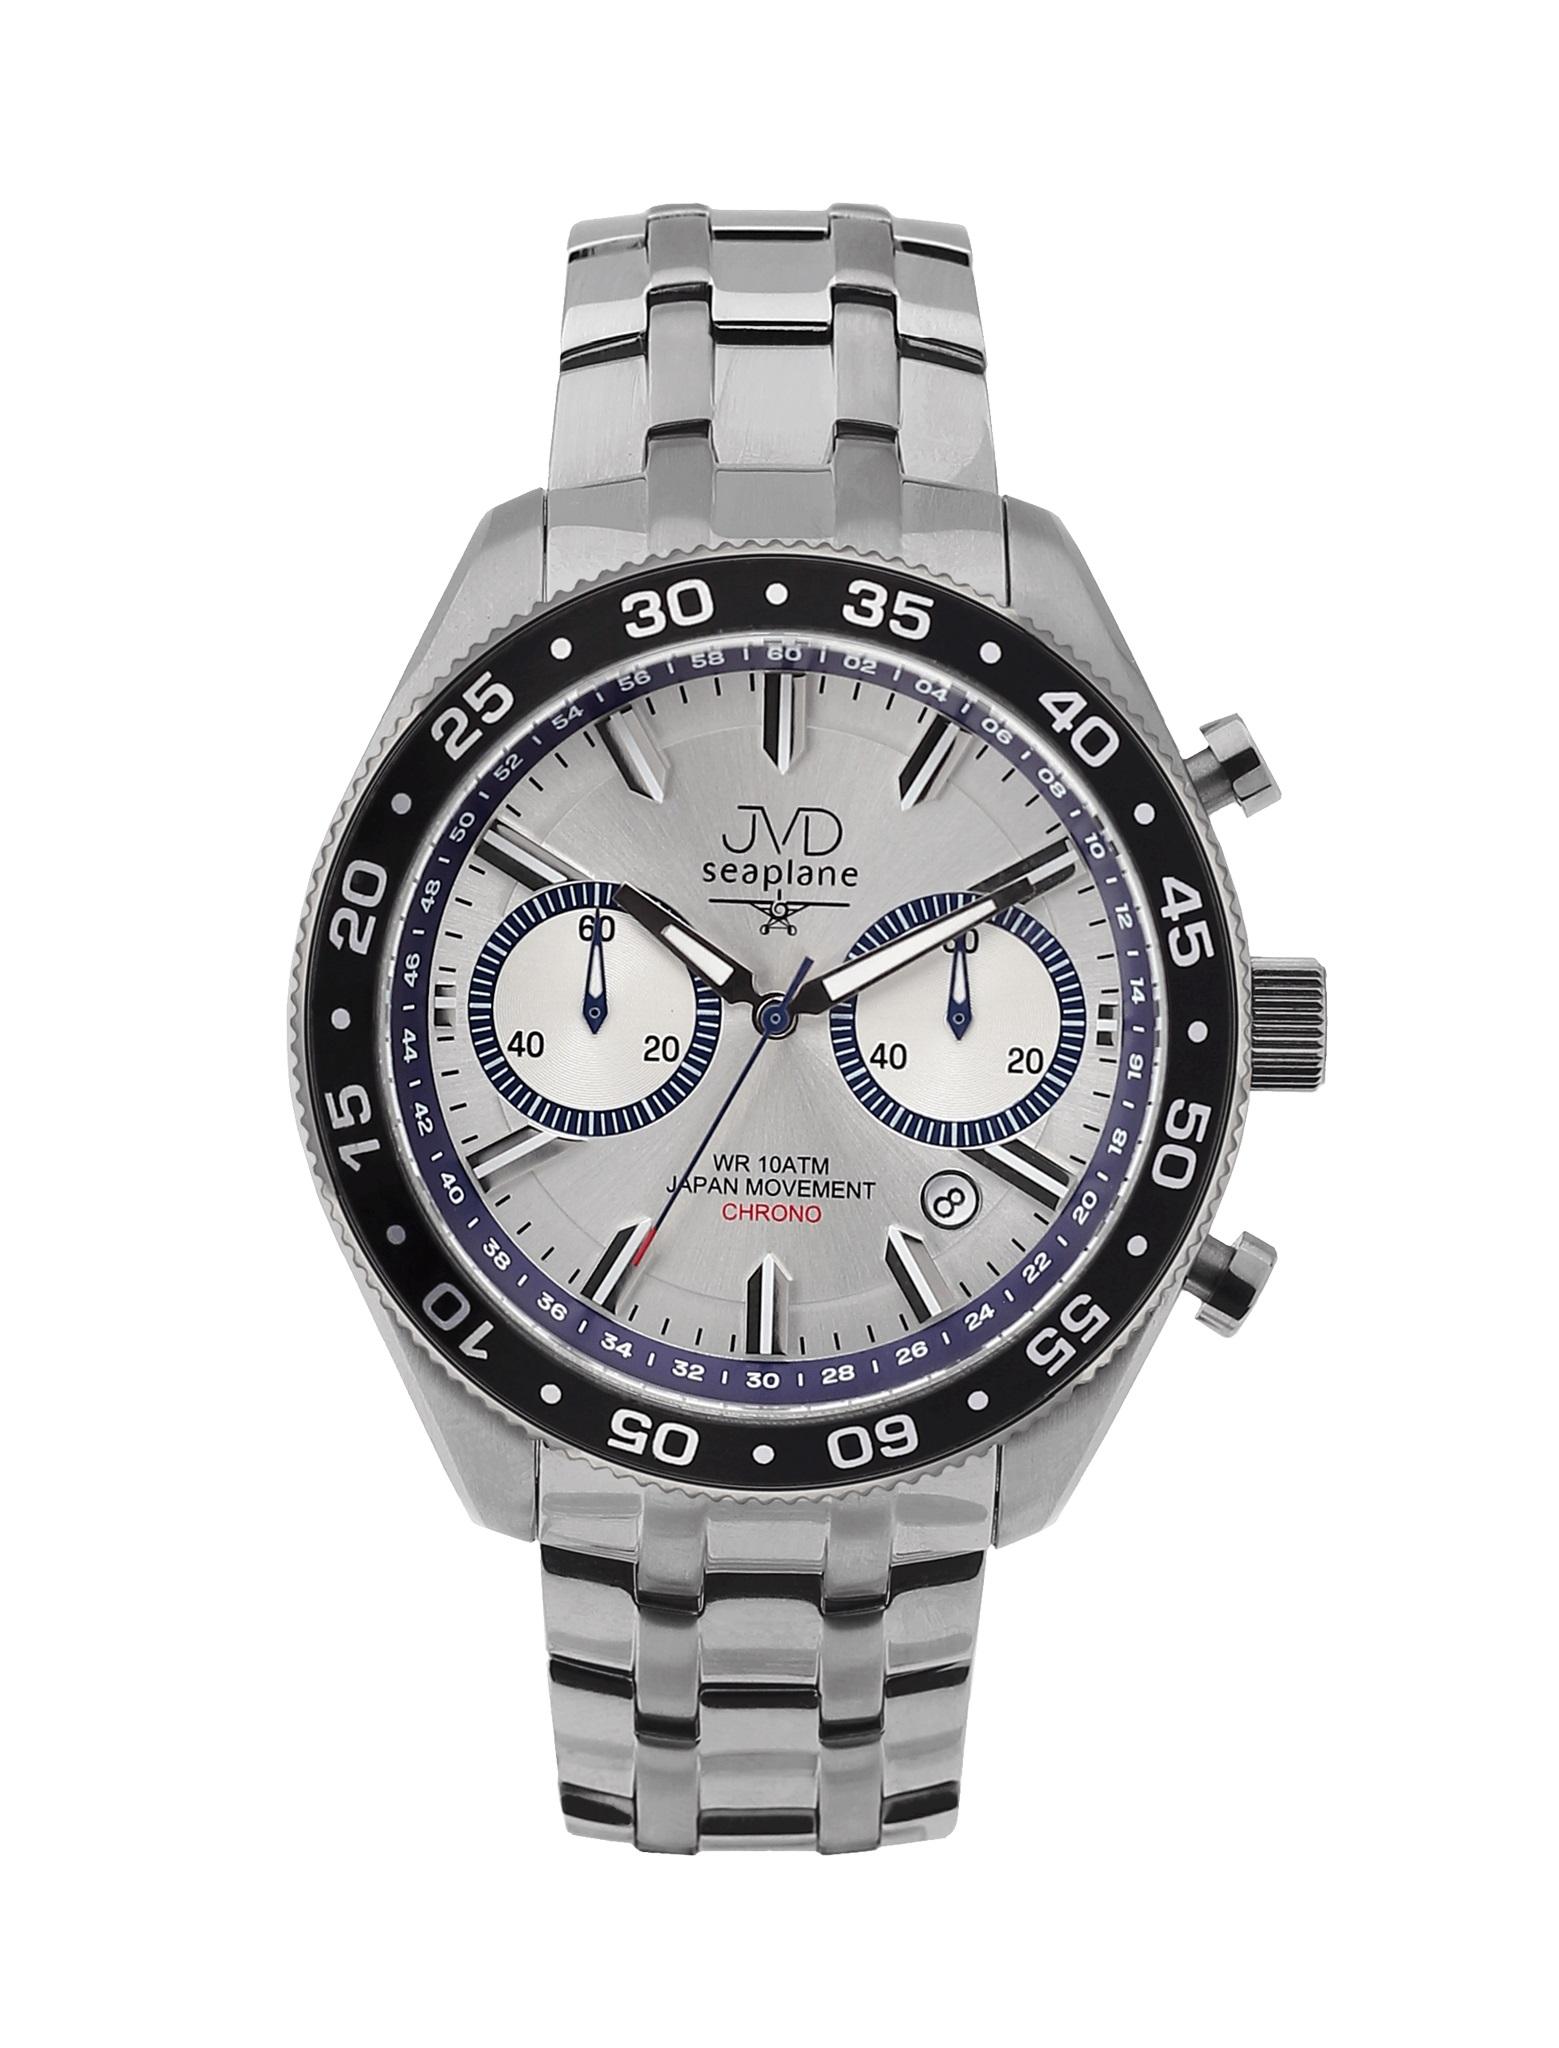 Pánské vodotěsné odolné náramkové hodinky Seaplane INFUSION J1117.1 (POŠTOVNÉ ZDARMA!!)